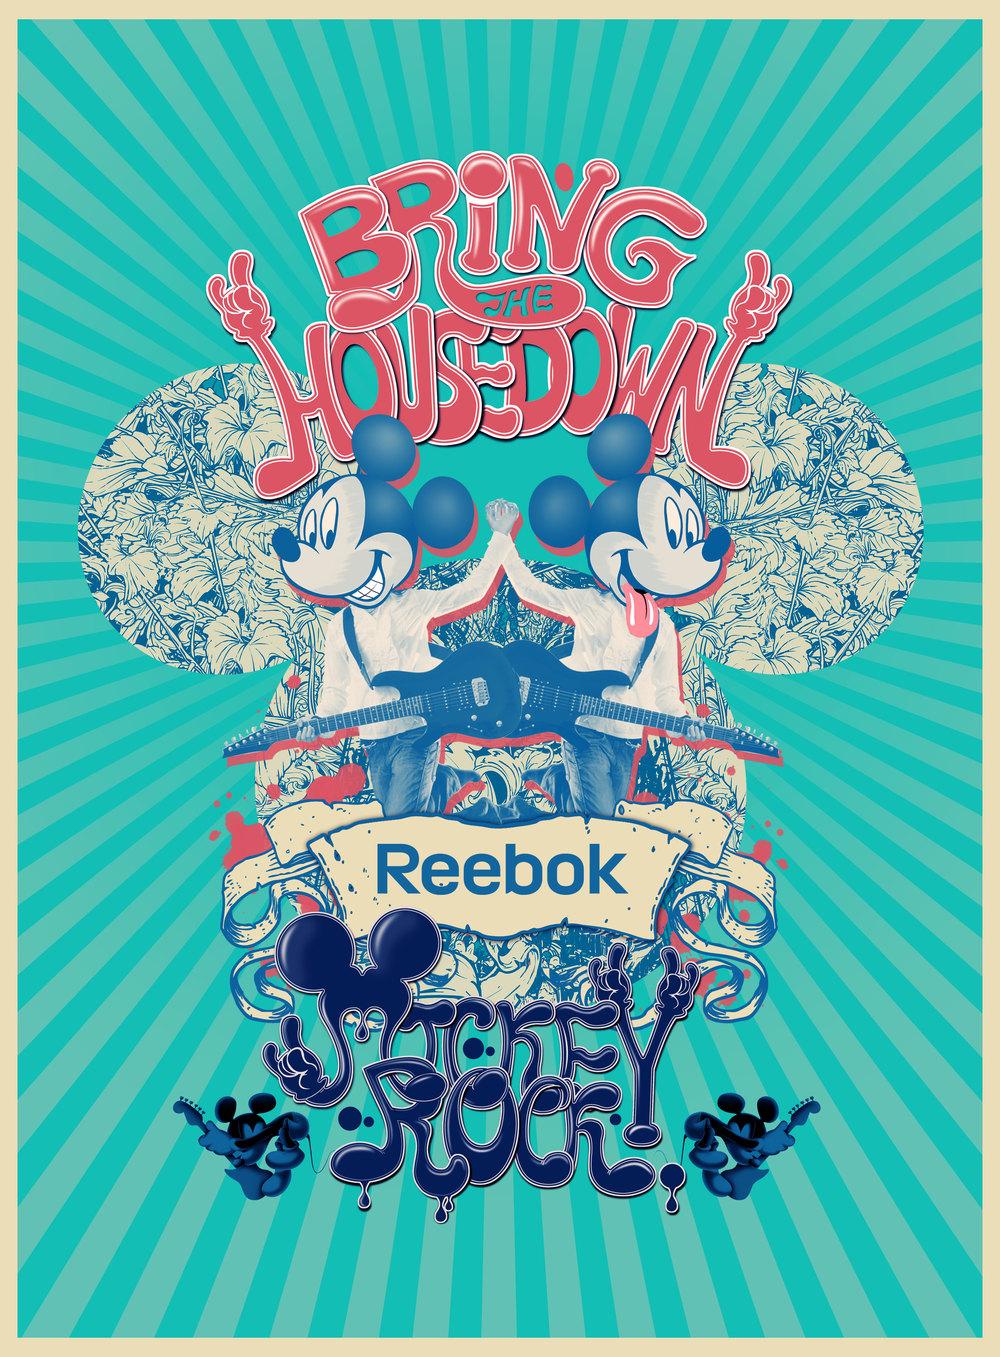 mickey-poster.jpg